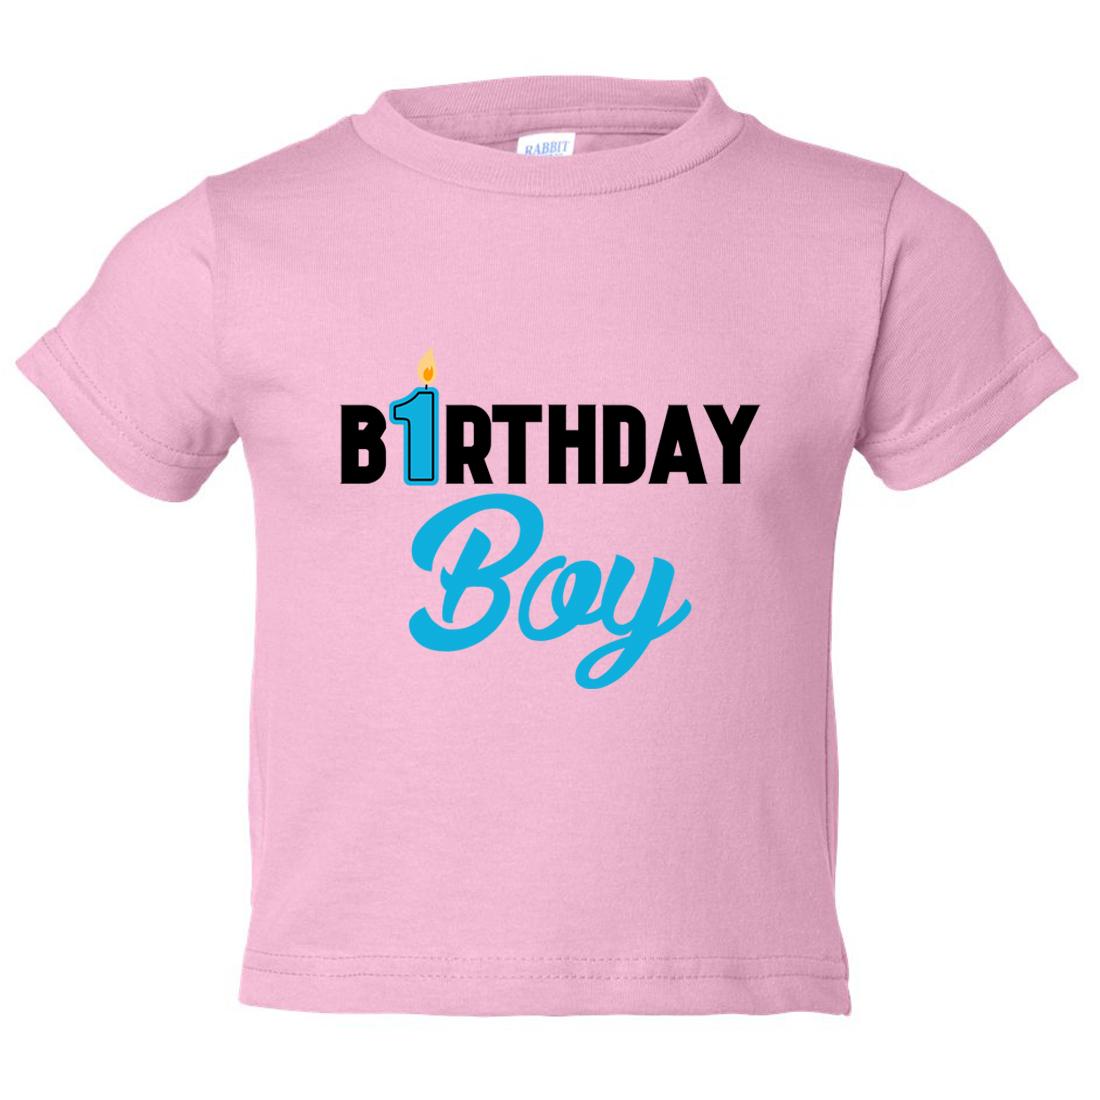 Boys 1 Year Old Birthday Boy Toddler Shirt Candle Funny Threadz Kids Light Pink 12 Month